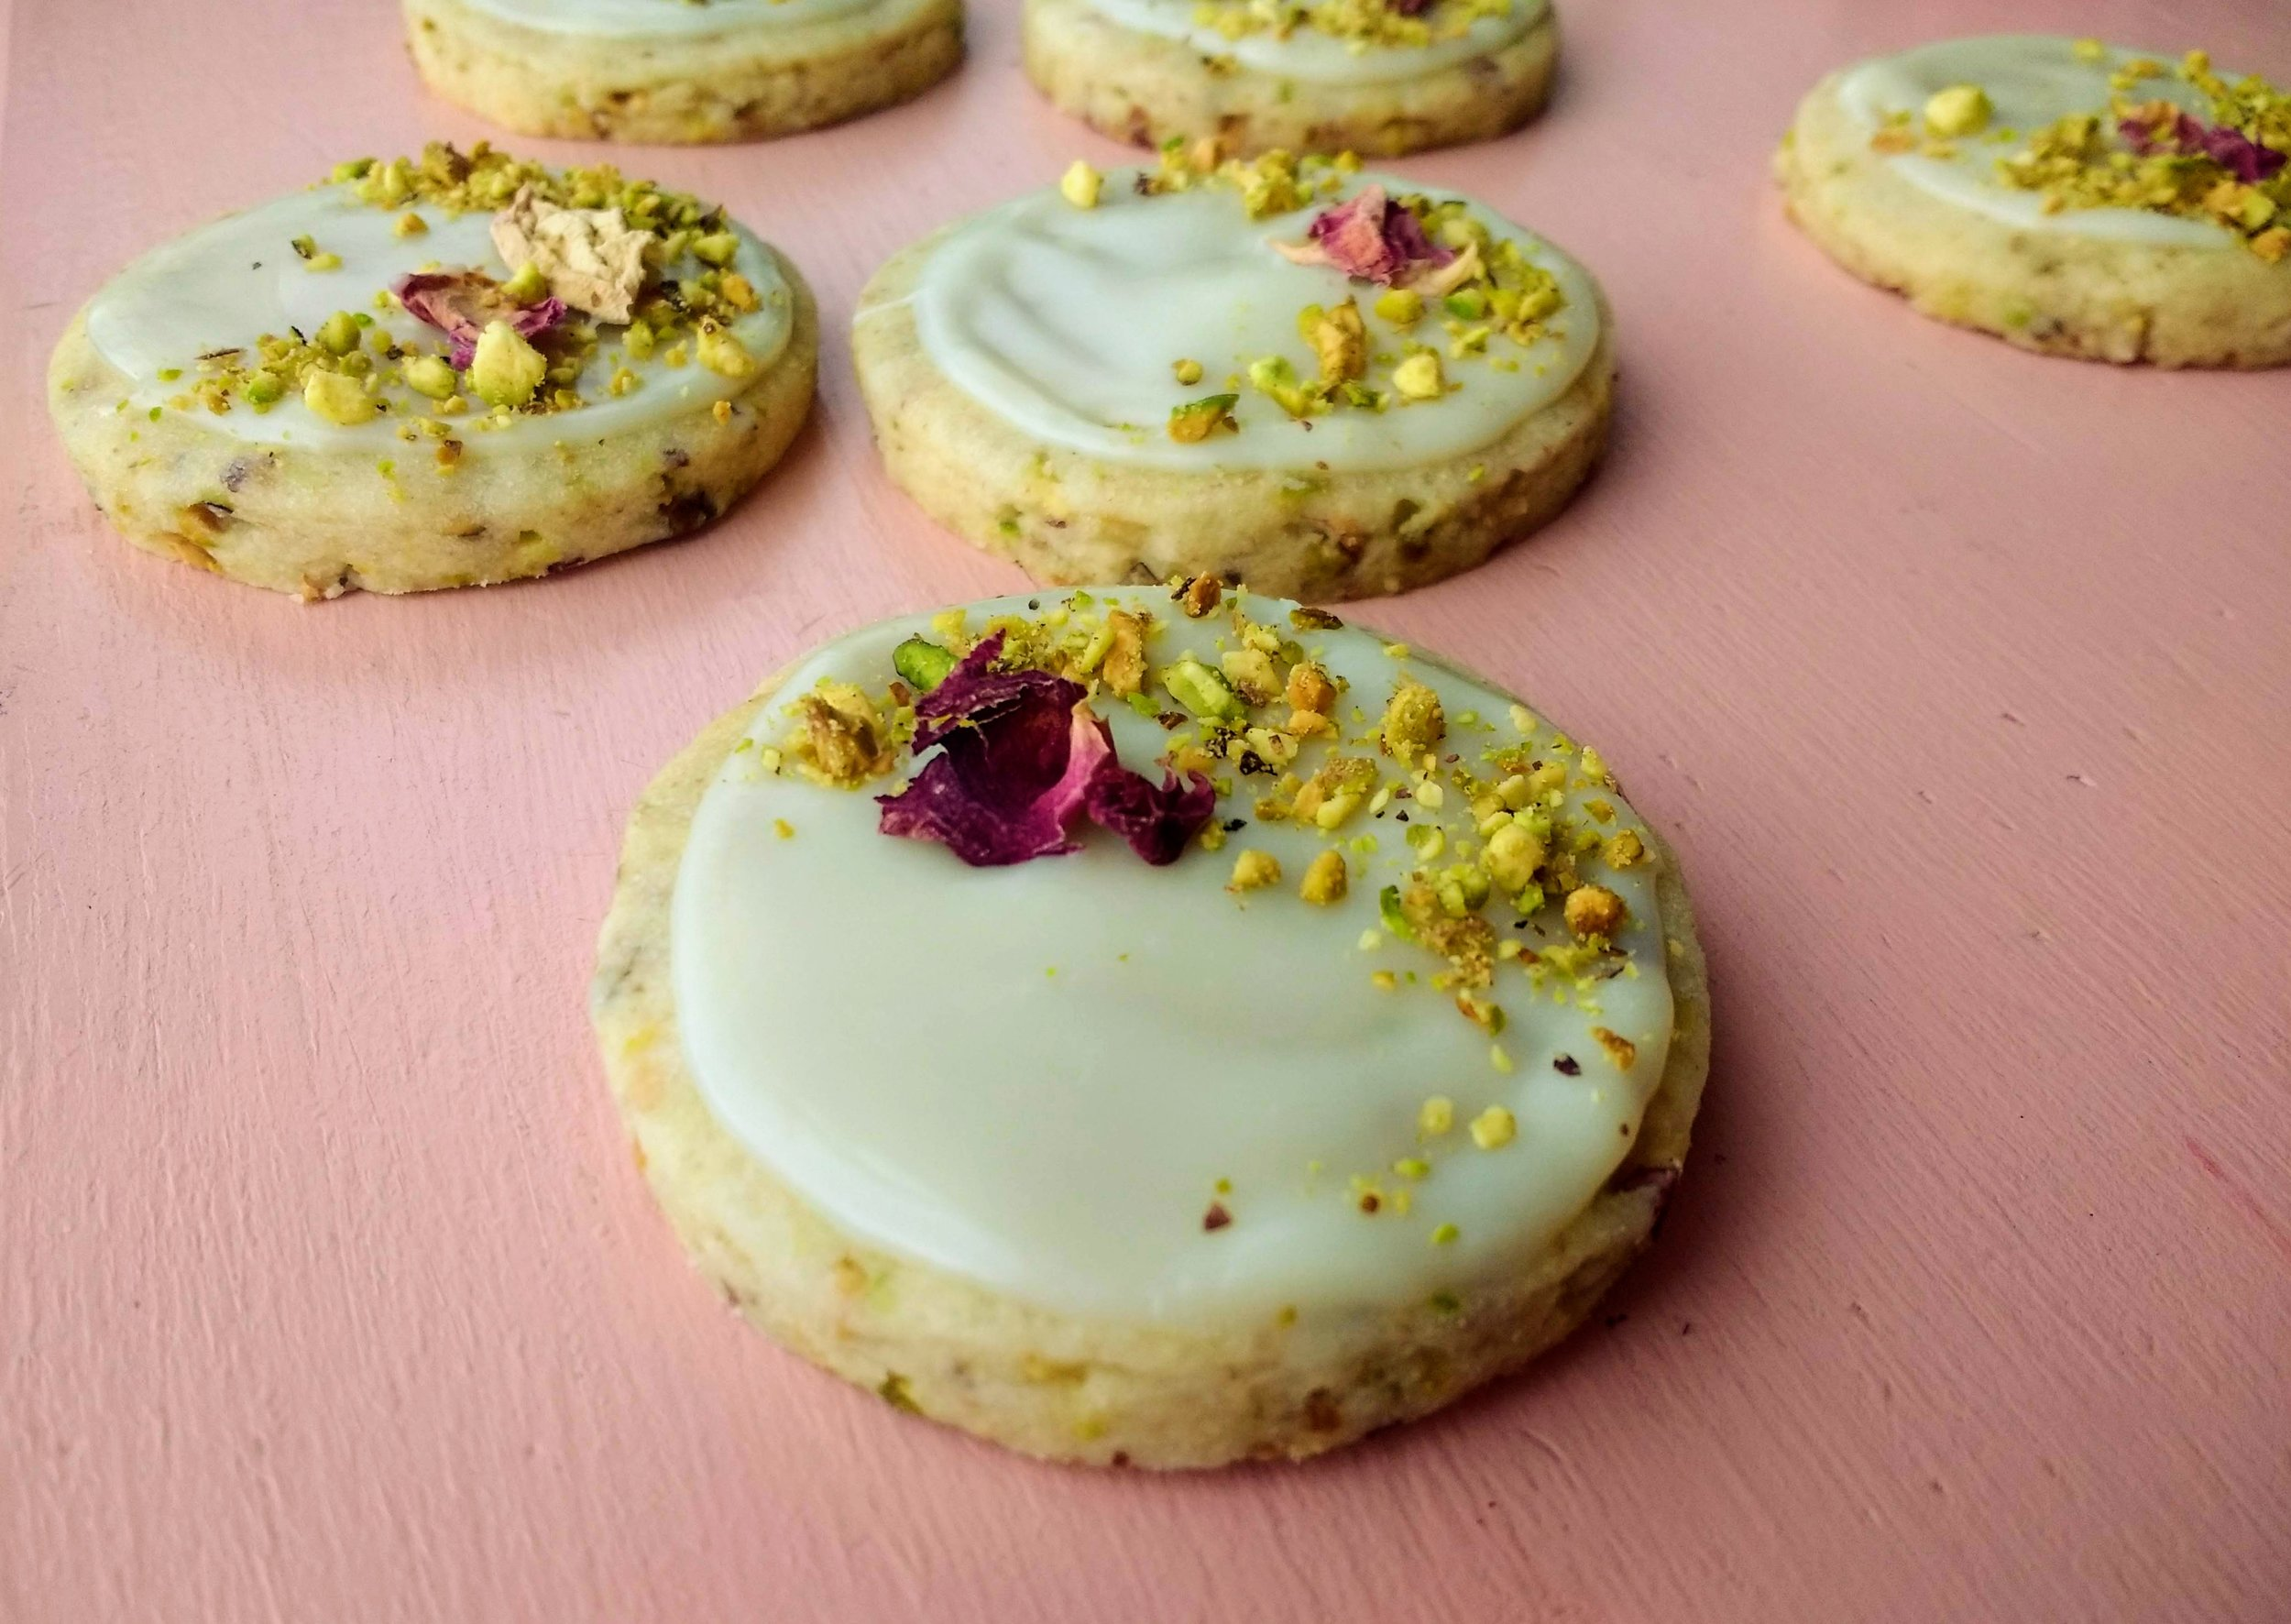 Beneath the Crust: Pistachio Rose Shortbread Cookies with White Chocolate Glaze